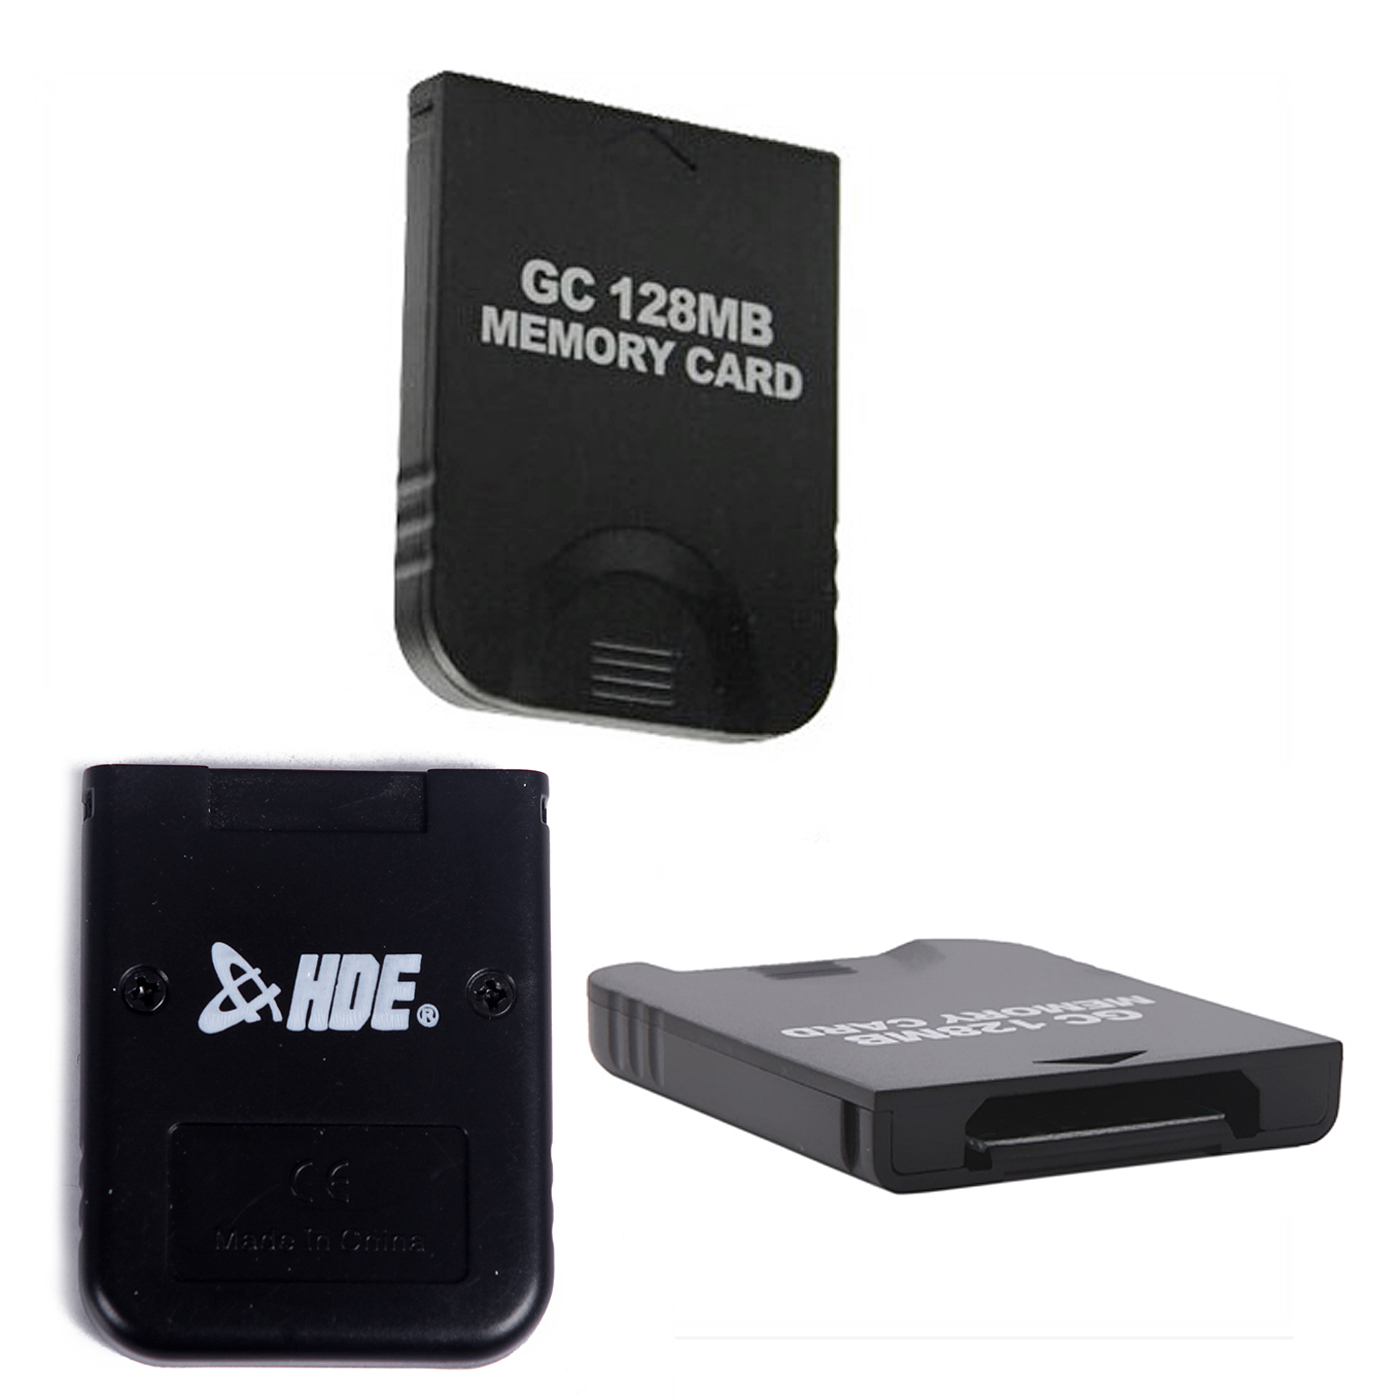 GameCube Memory Card 128Mb (2048 Blocks) Storage Capacity Retro Video Game Accessory (Black)